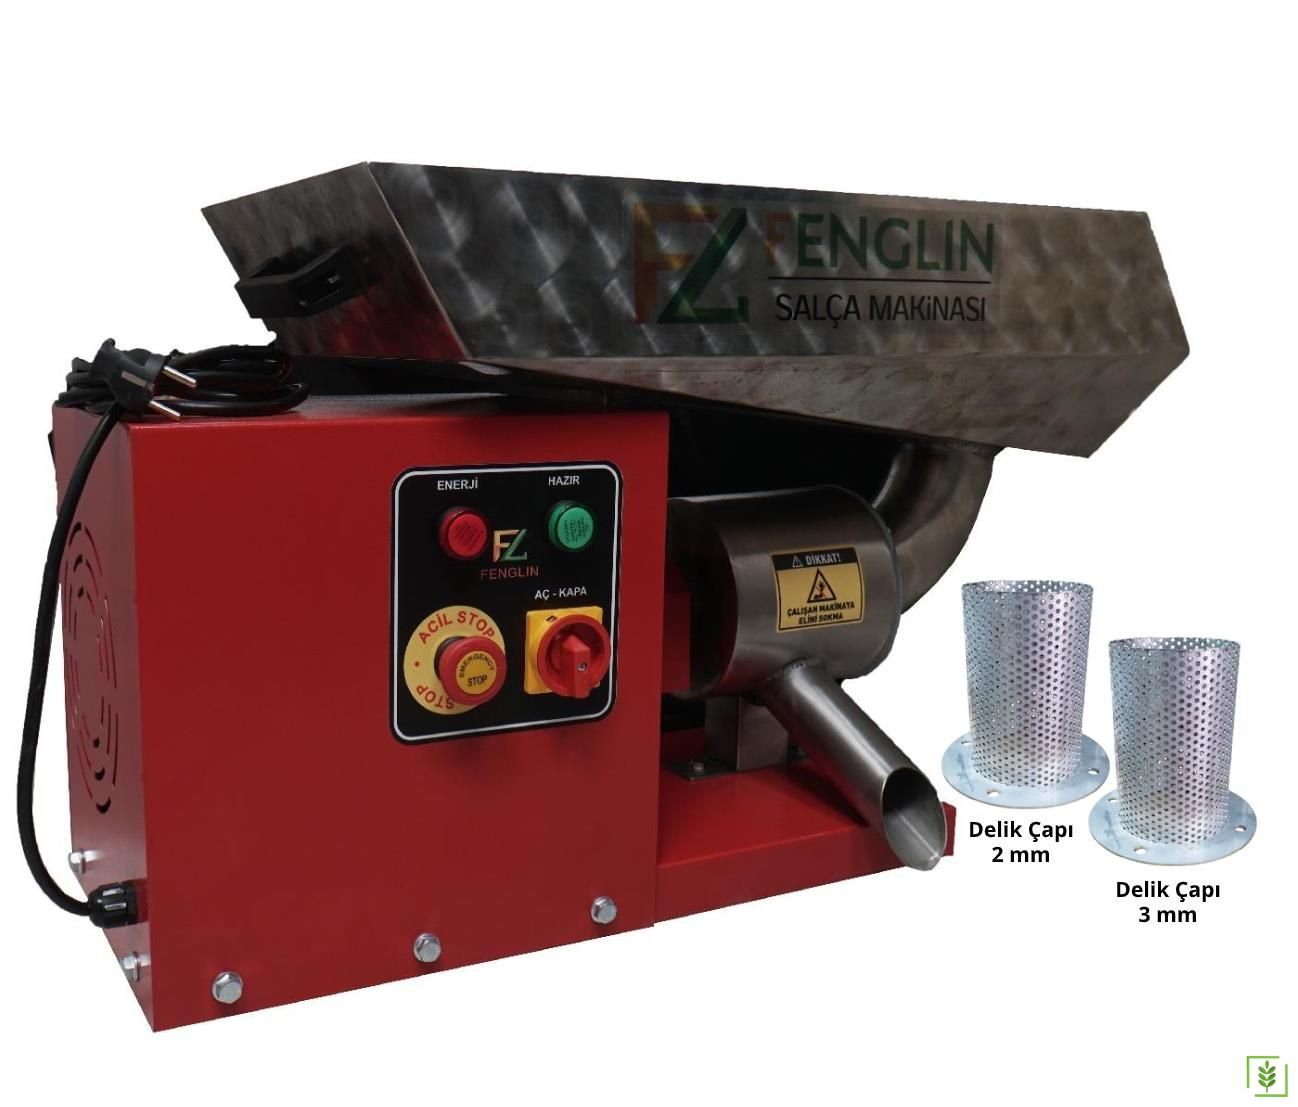 Fenglin FNG-2000 Profesyonel Salça Makinası Çift Elekli